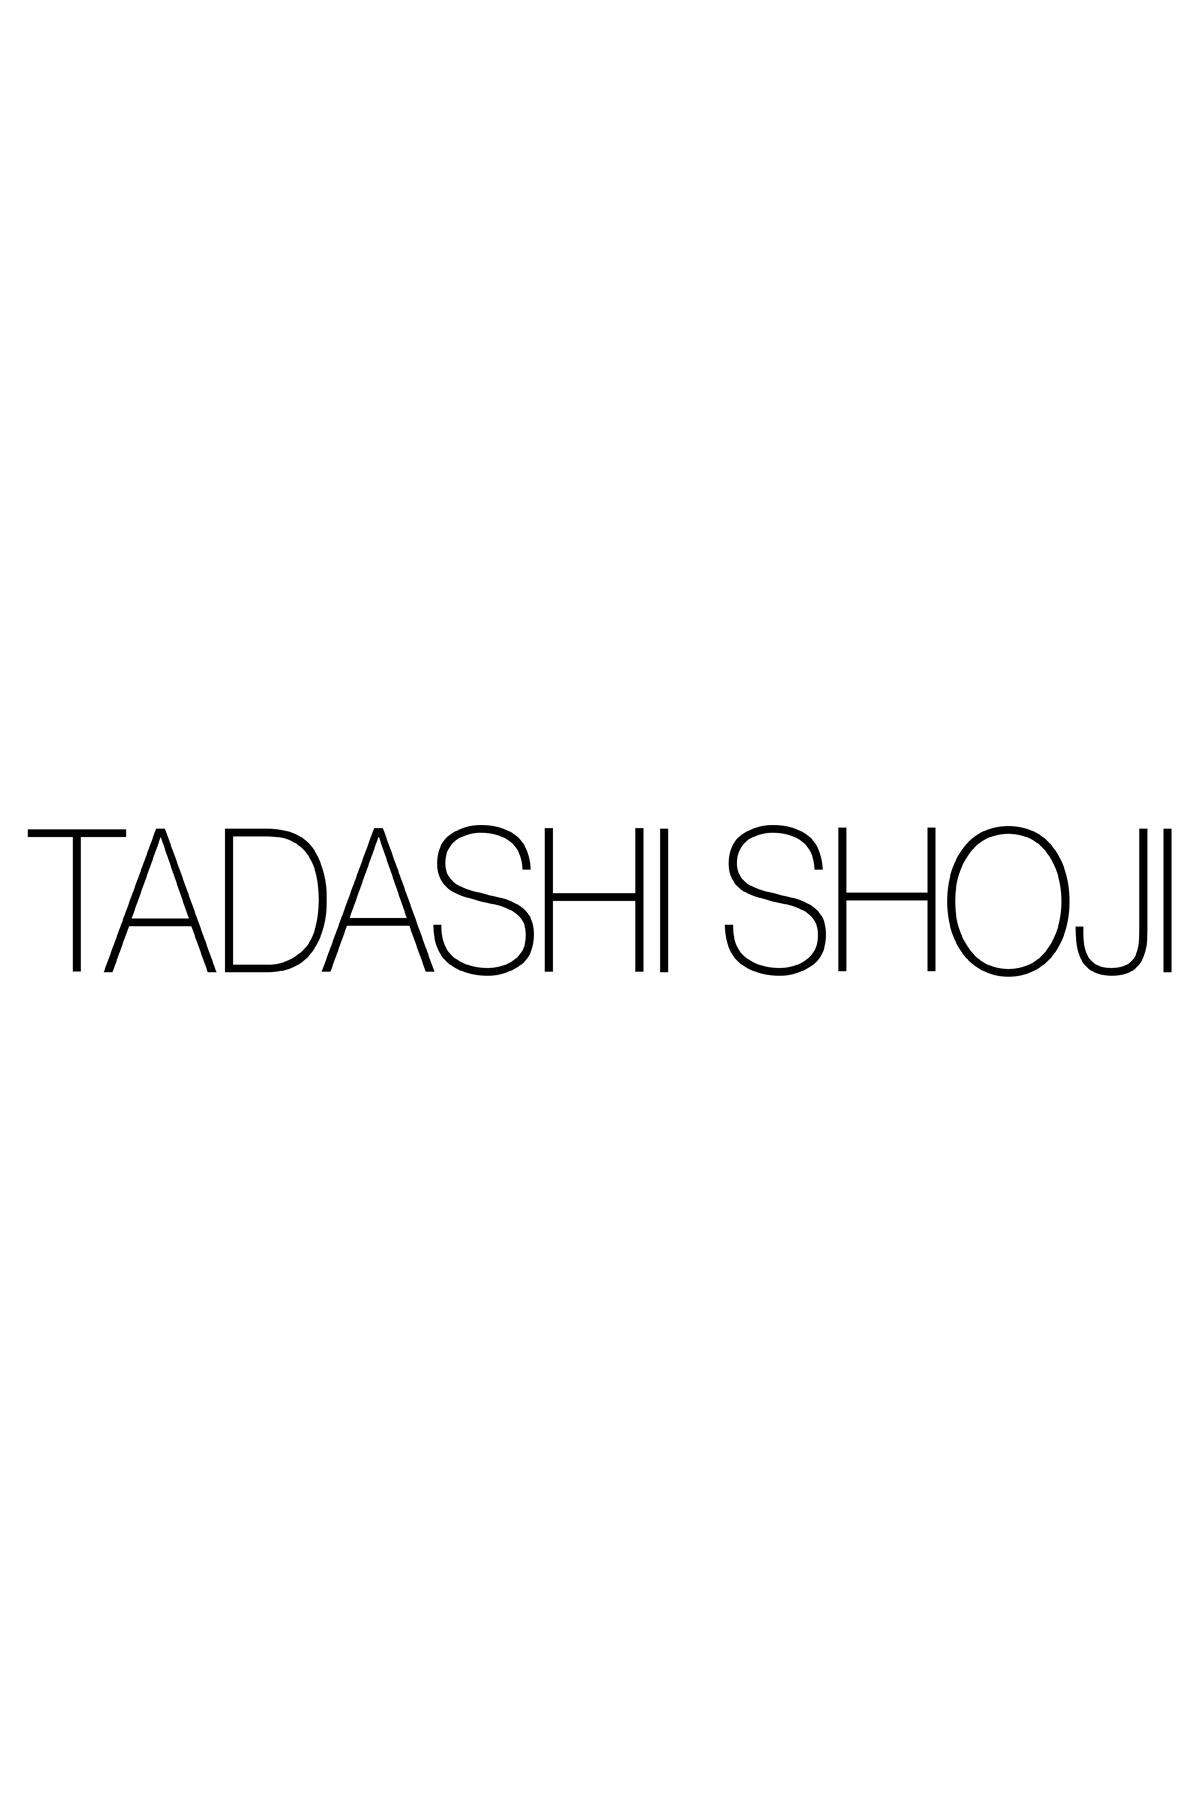 Tadashi Shoji - Gerst Sequin Embroidered Dress - PETITE